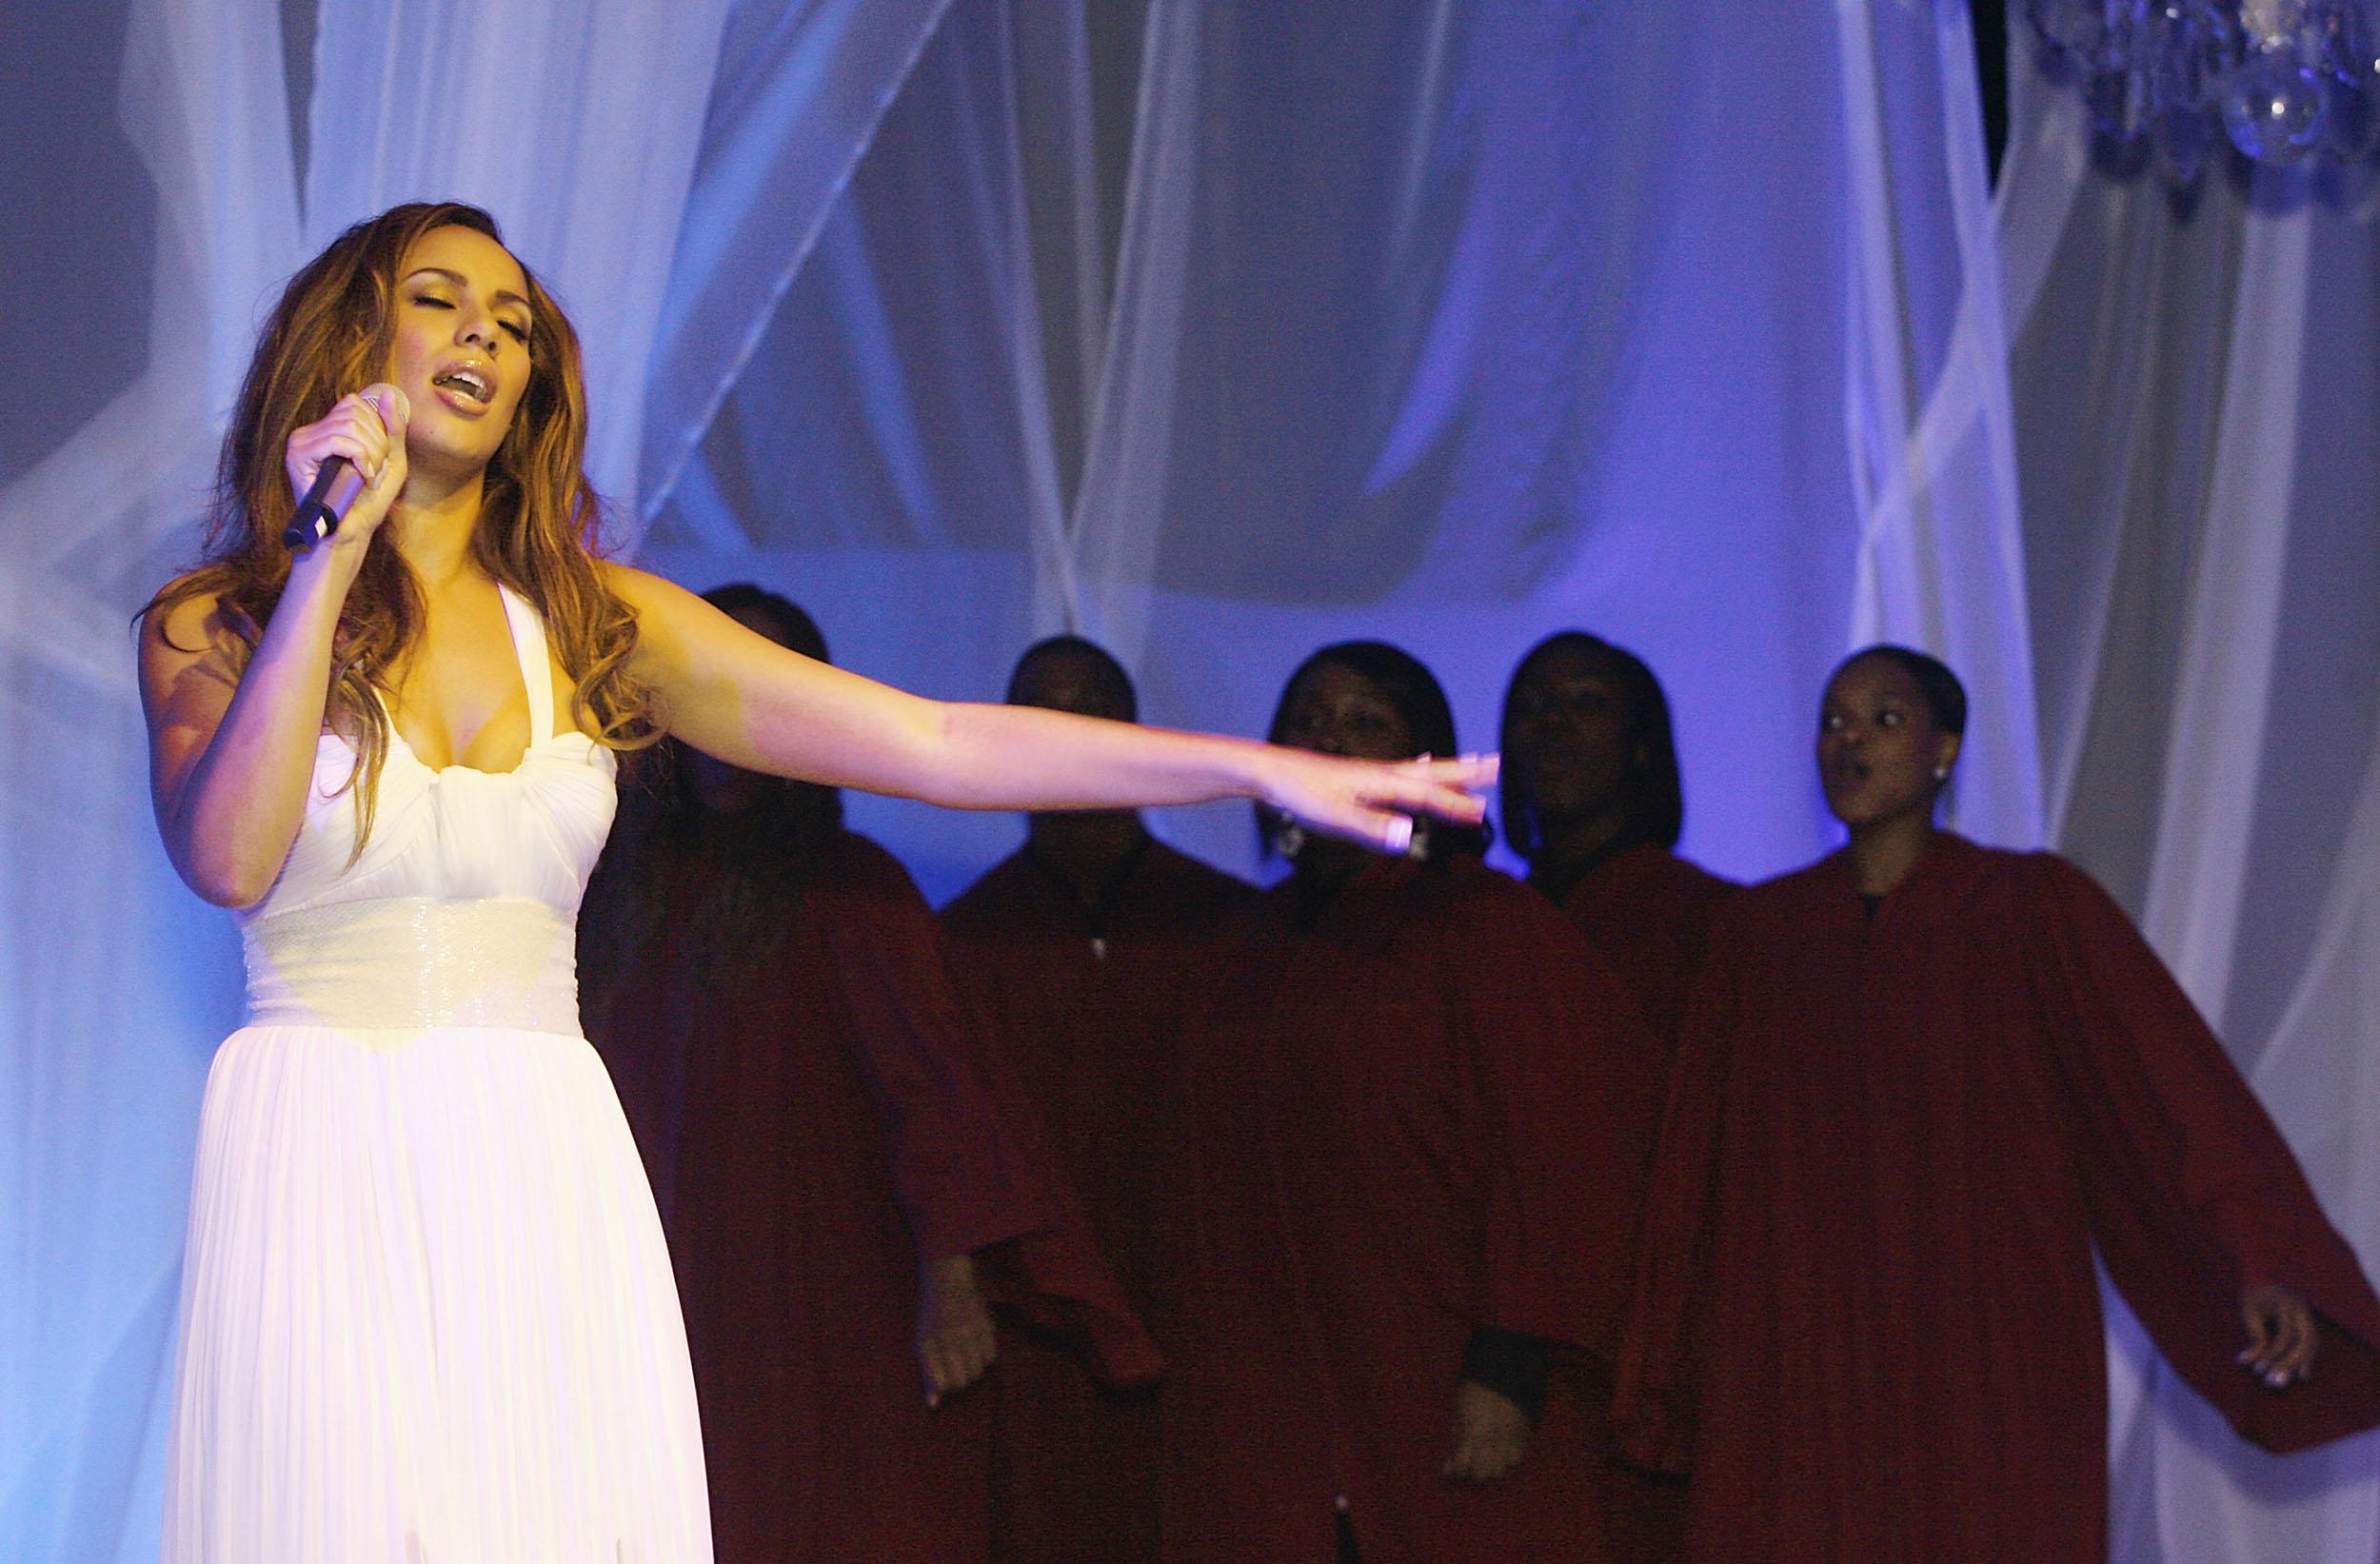 Leona Lewis launches long-awaited single (AUDIO)